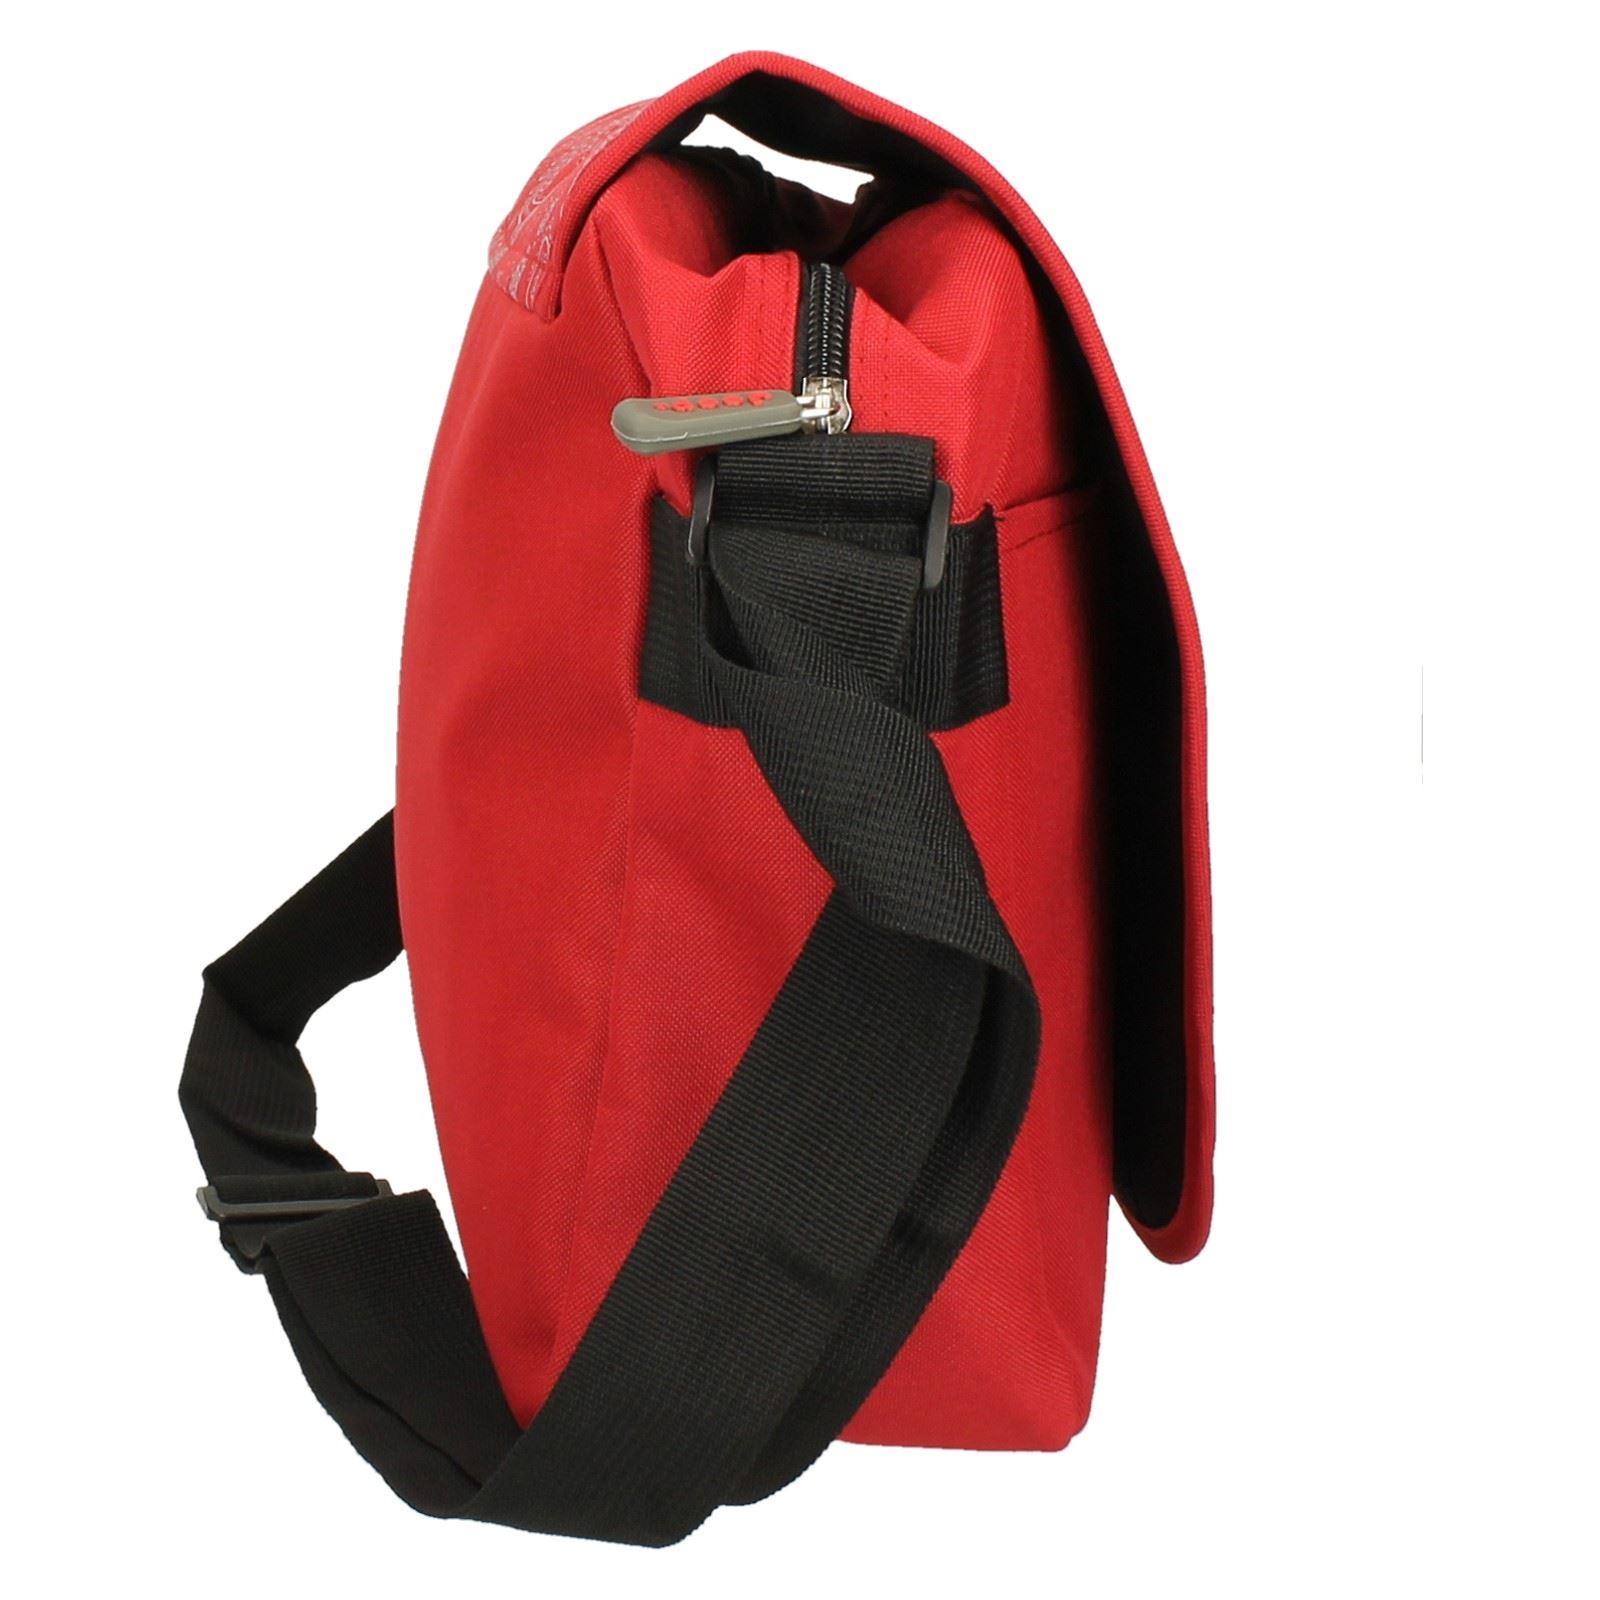 10b9c778554f Jeep Ladies Girls Red Floral Print School Laptop Computer Messenger Courier  Bag. Product Details